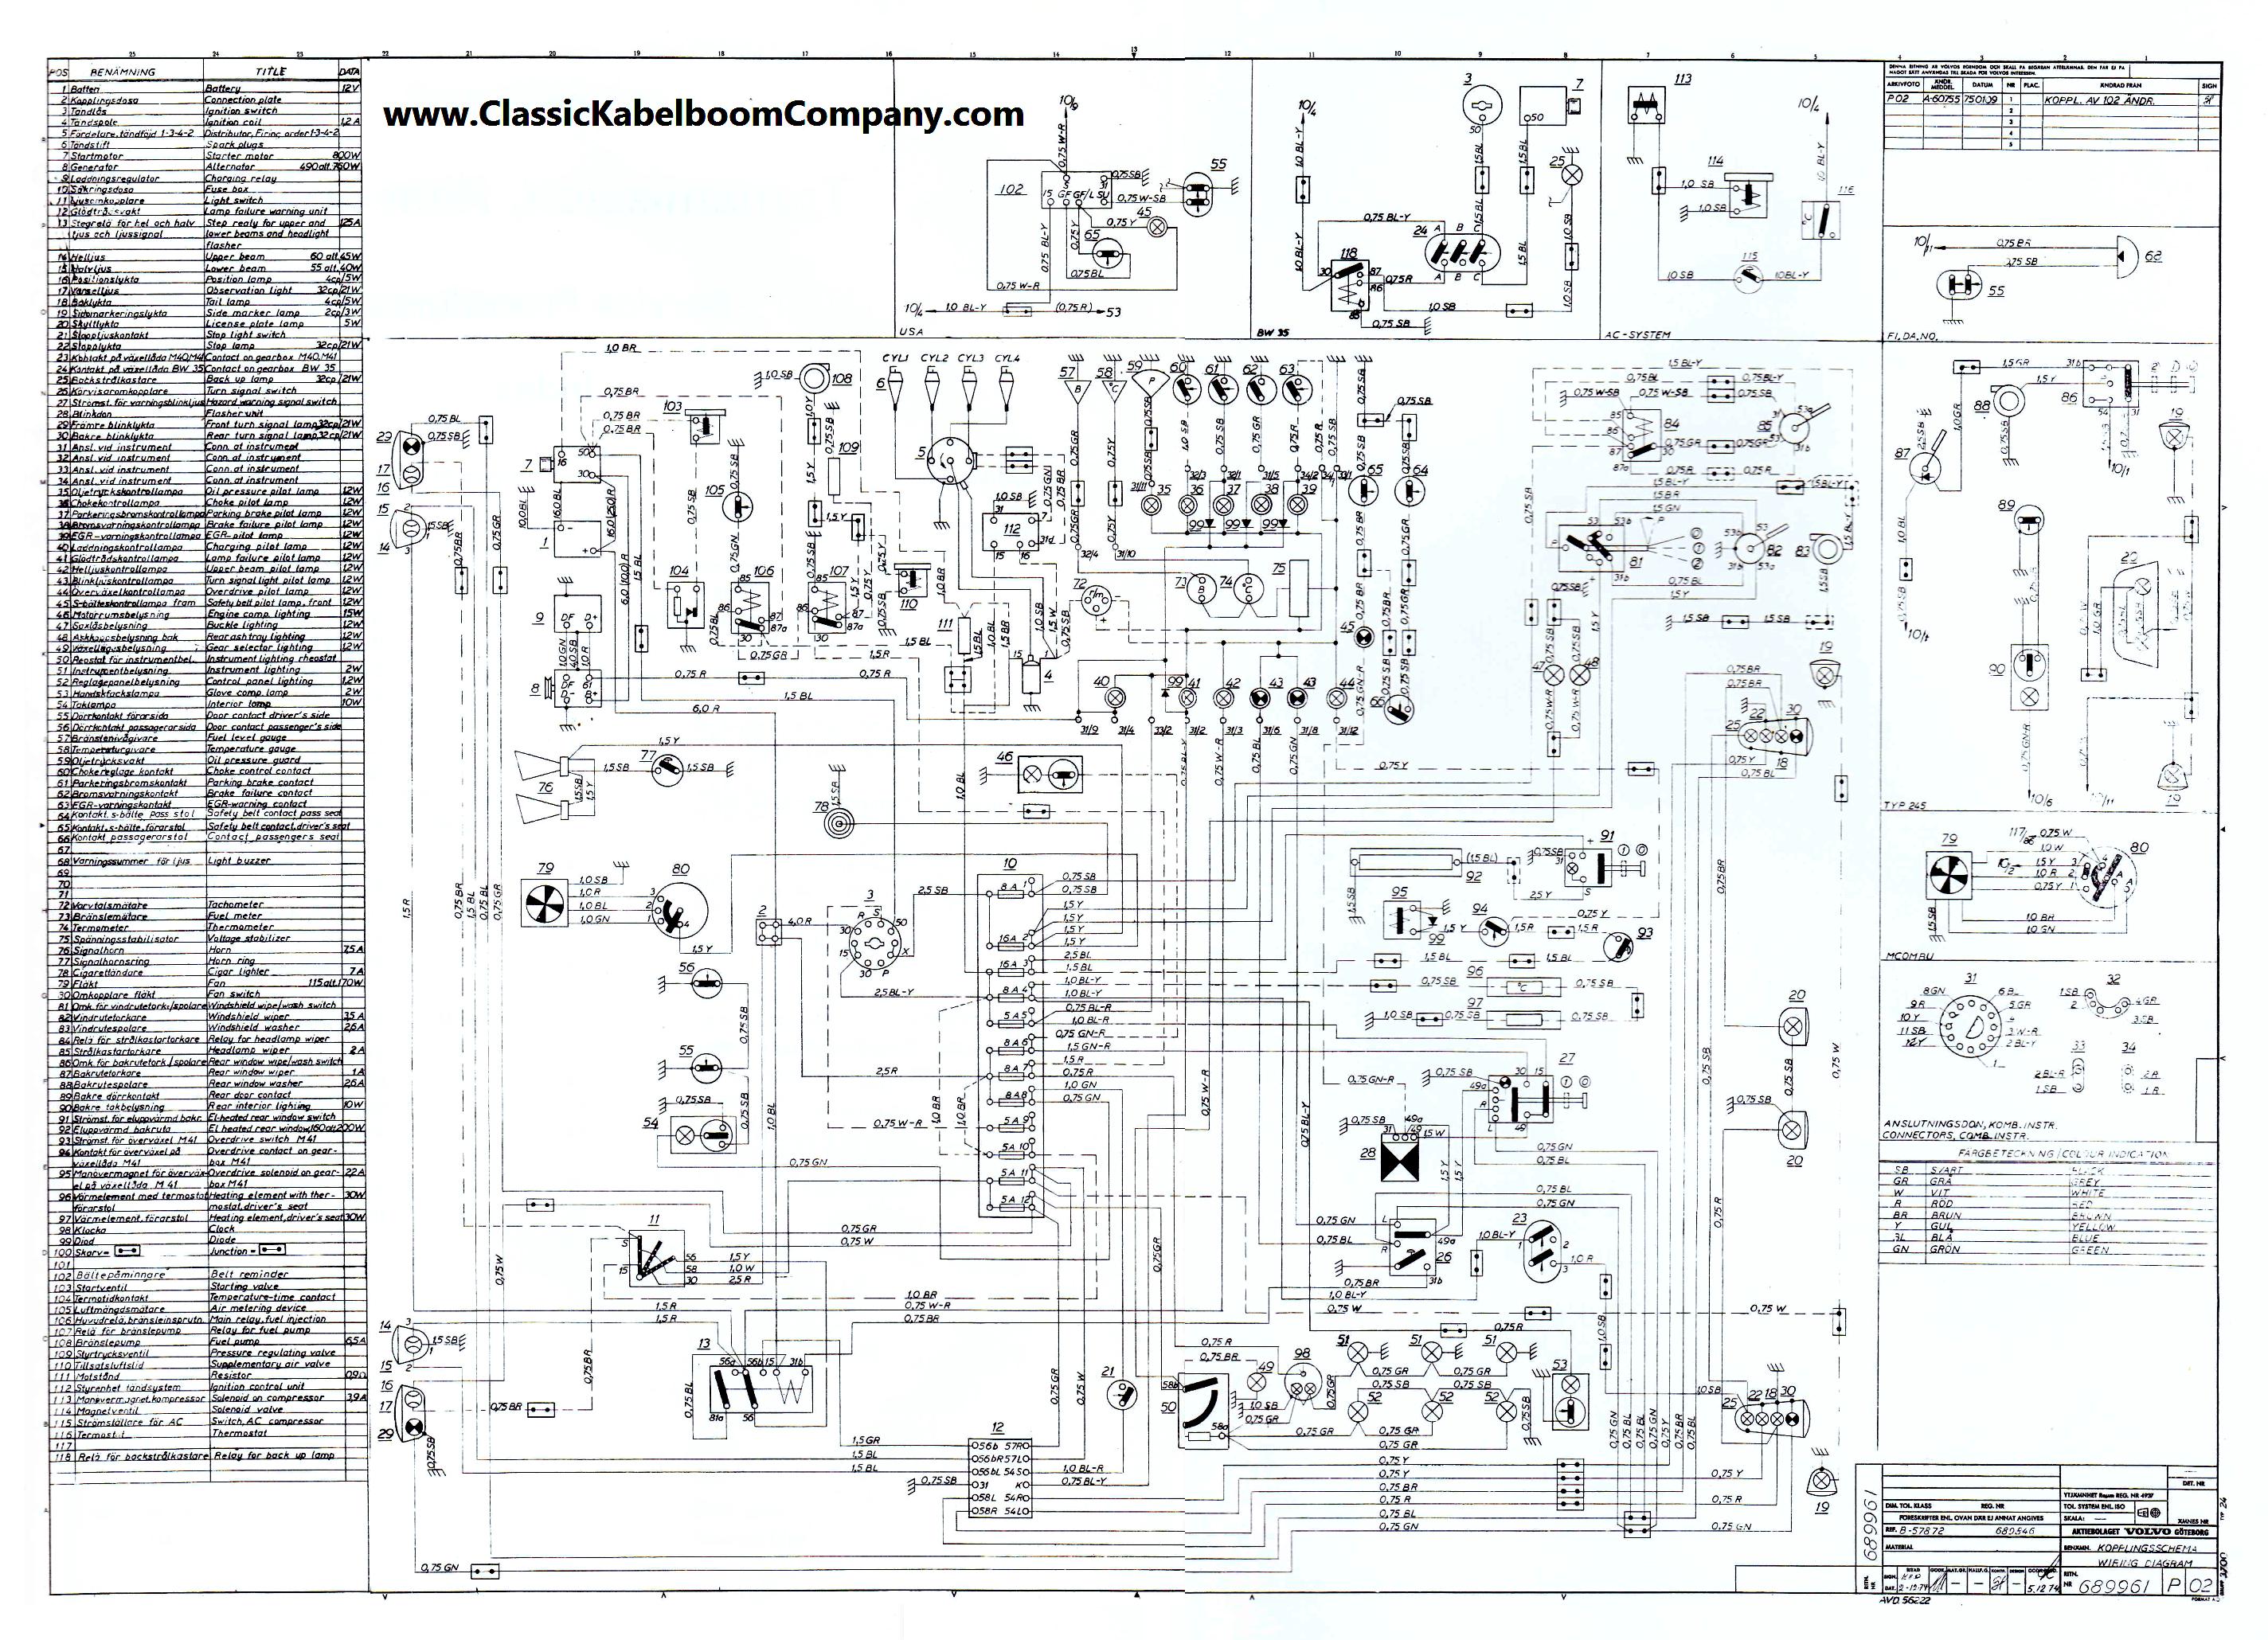 vol40?cdp=a classic kabelboom company elektrisch bedrading schema volvo volvo 240 ignition wiring diagram at bayanpartner.co